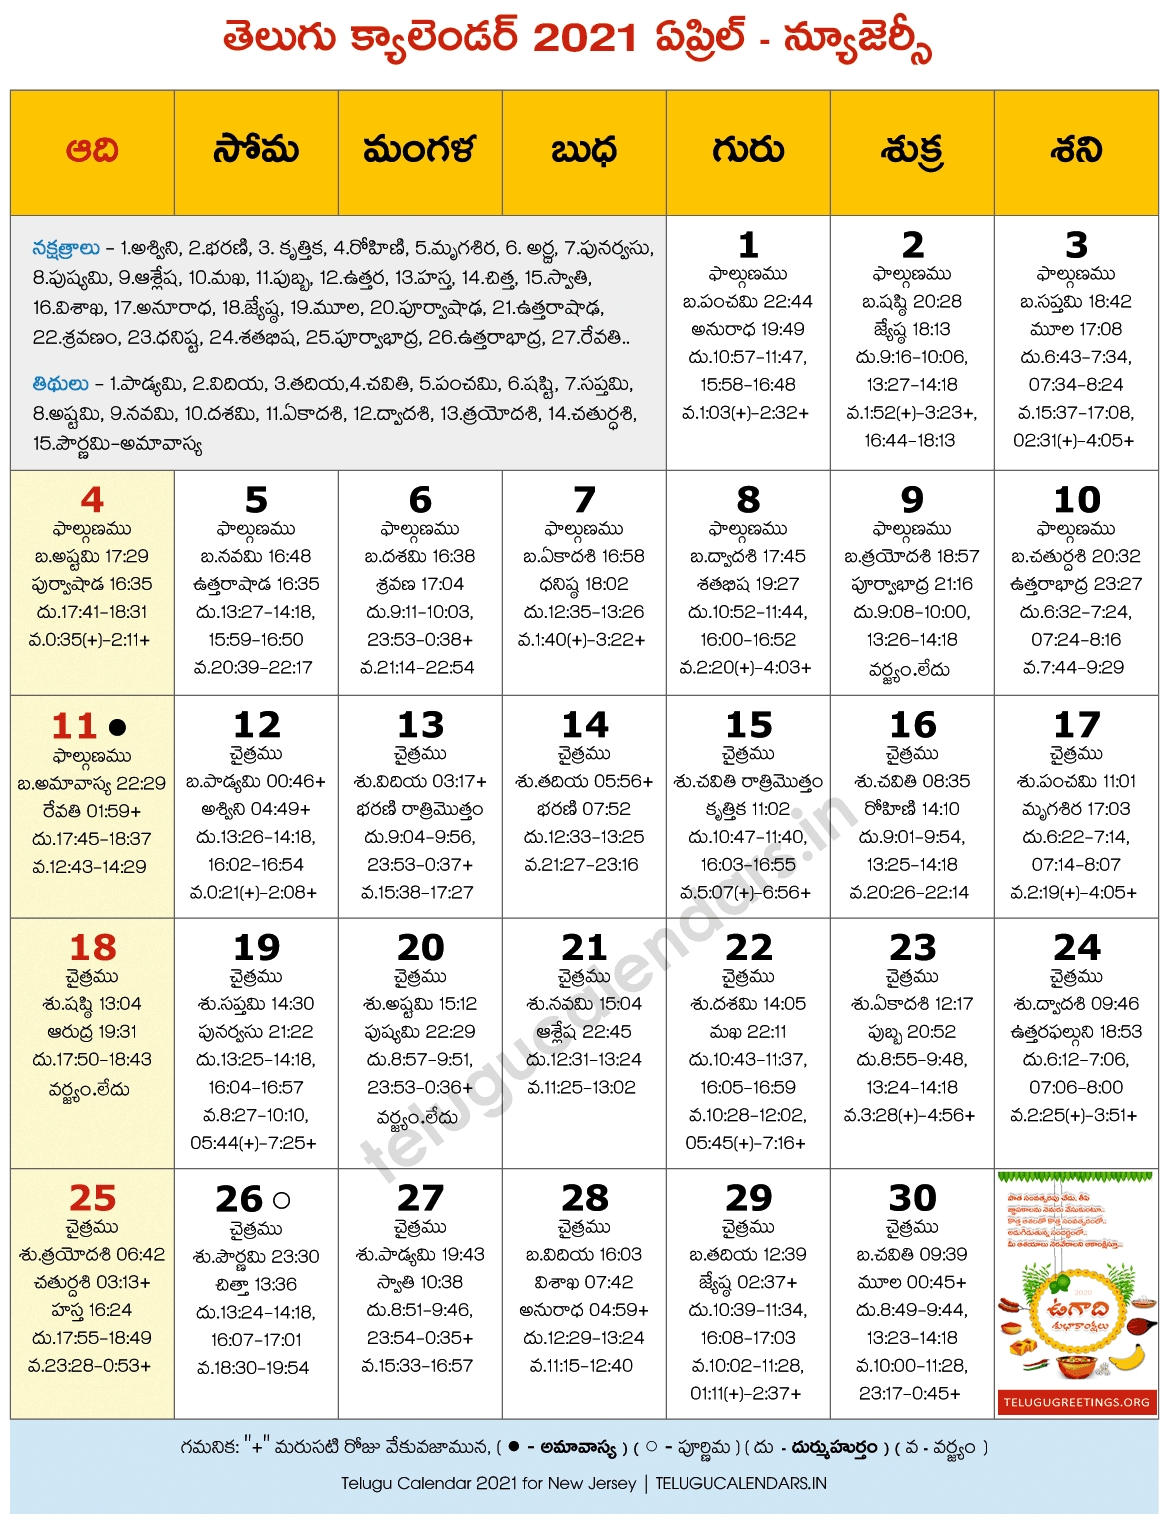 Calendar July 2021: Telugu Calendar 2021 April Andhra Pradesh Telugu Calendar 2021 October Andhra Pradesh